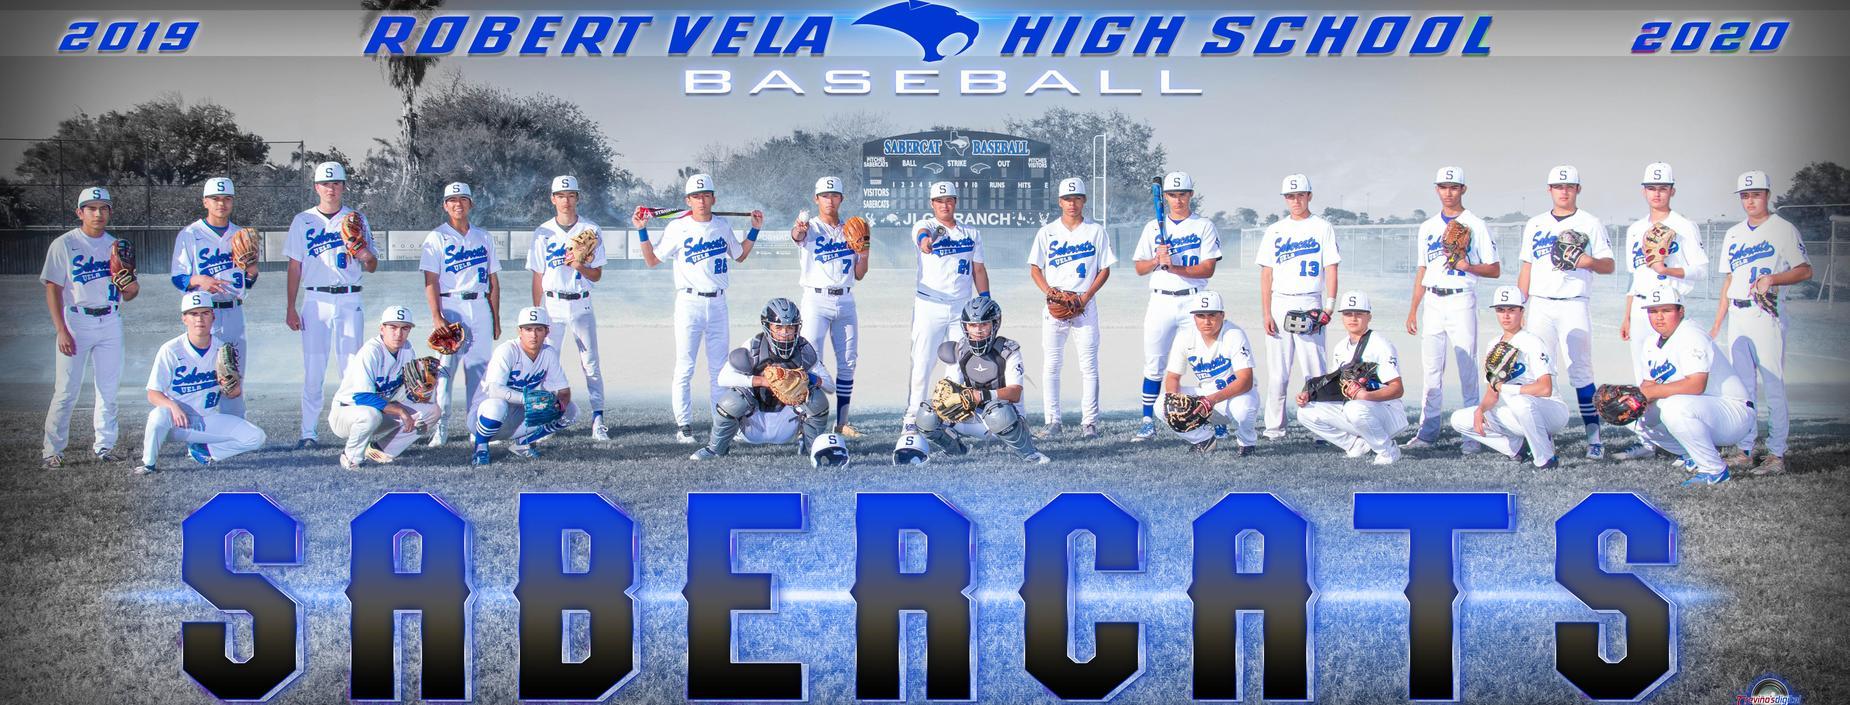 RVHS Baseball Team 2019-2020